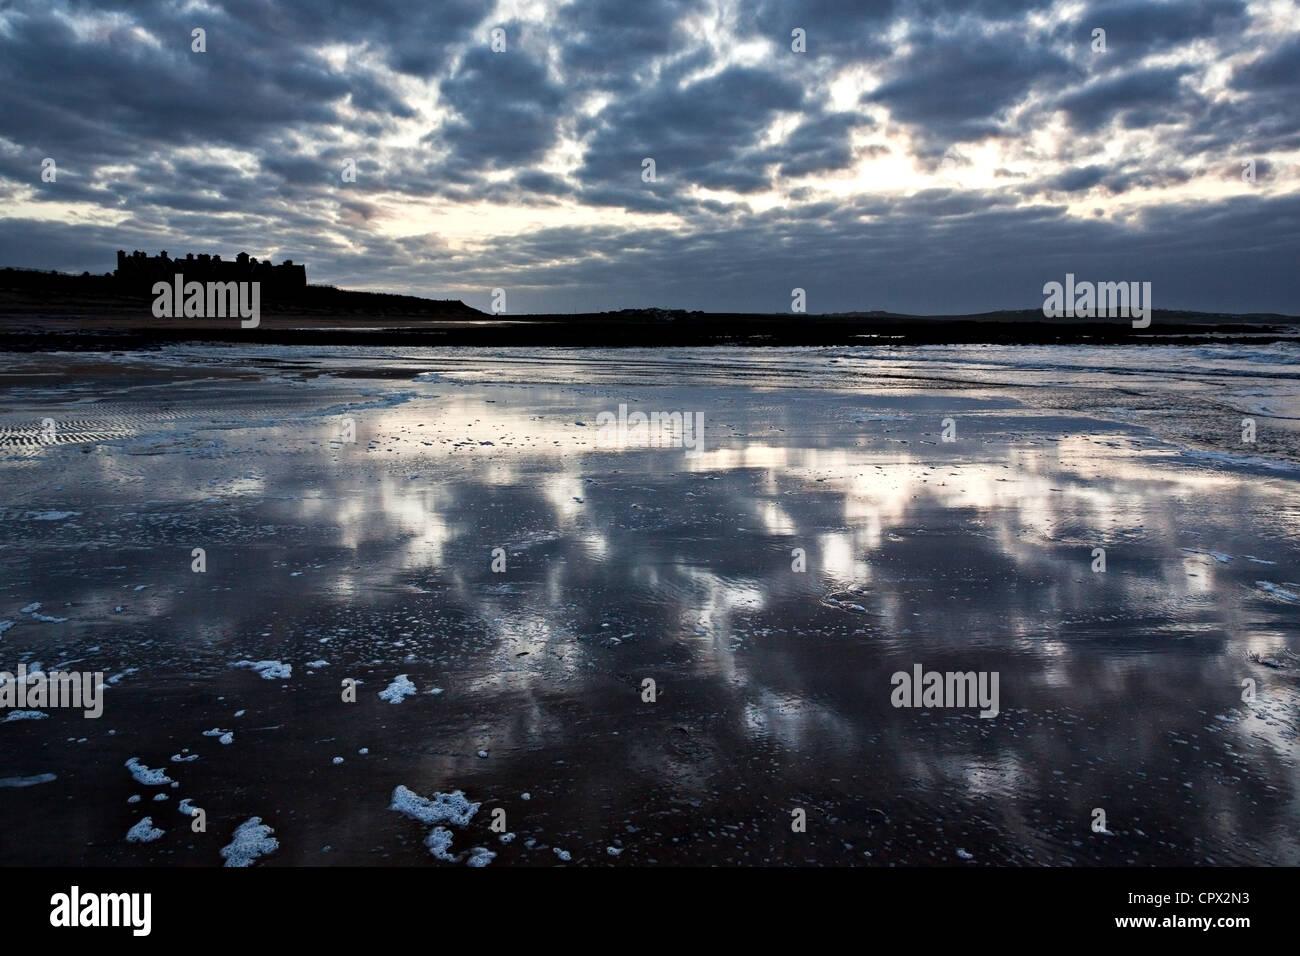 Doughmore beach, doonbeg, county clare, ireland - Stock Image